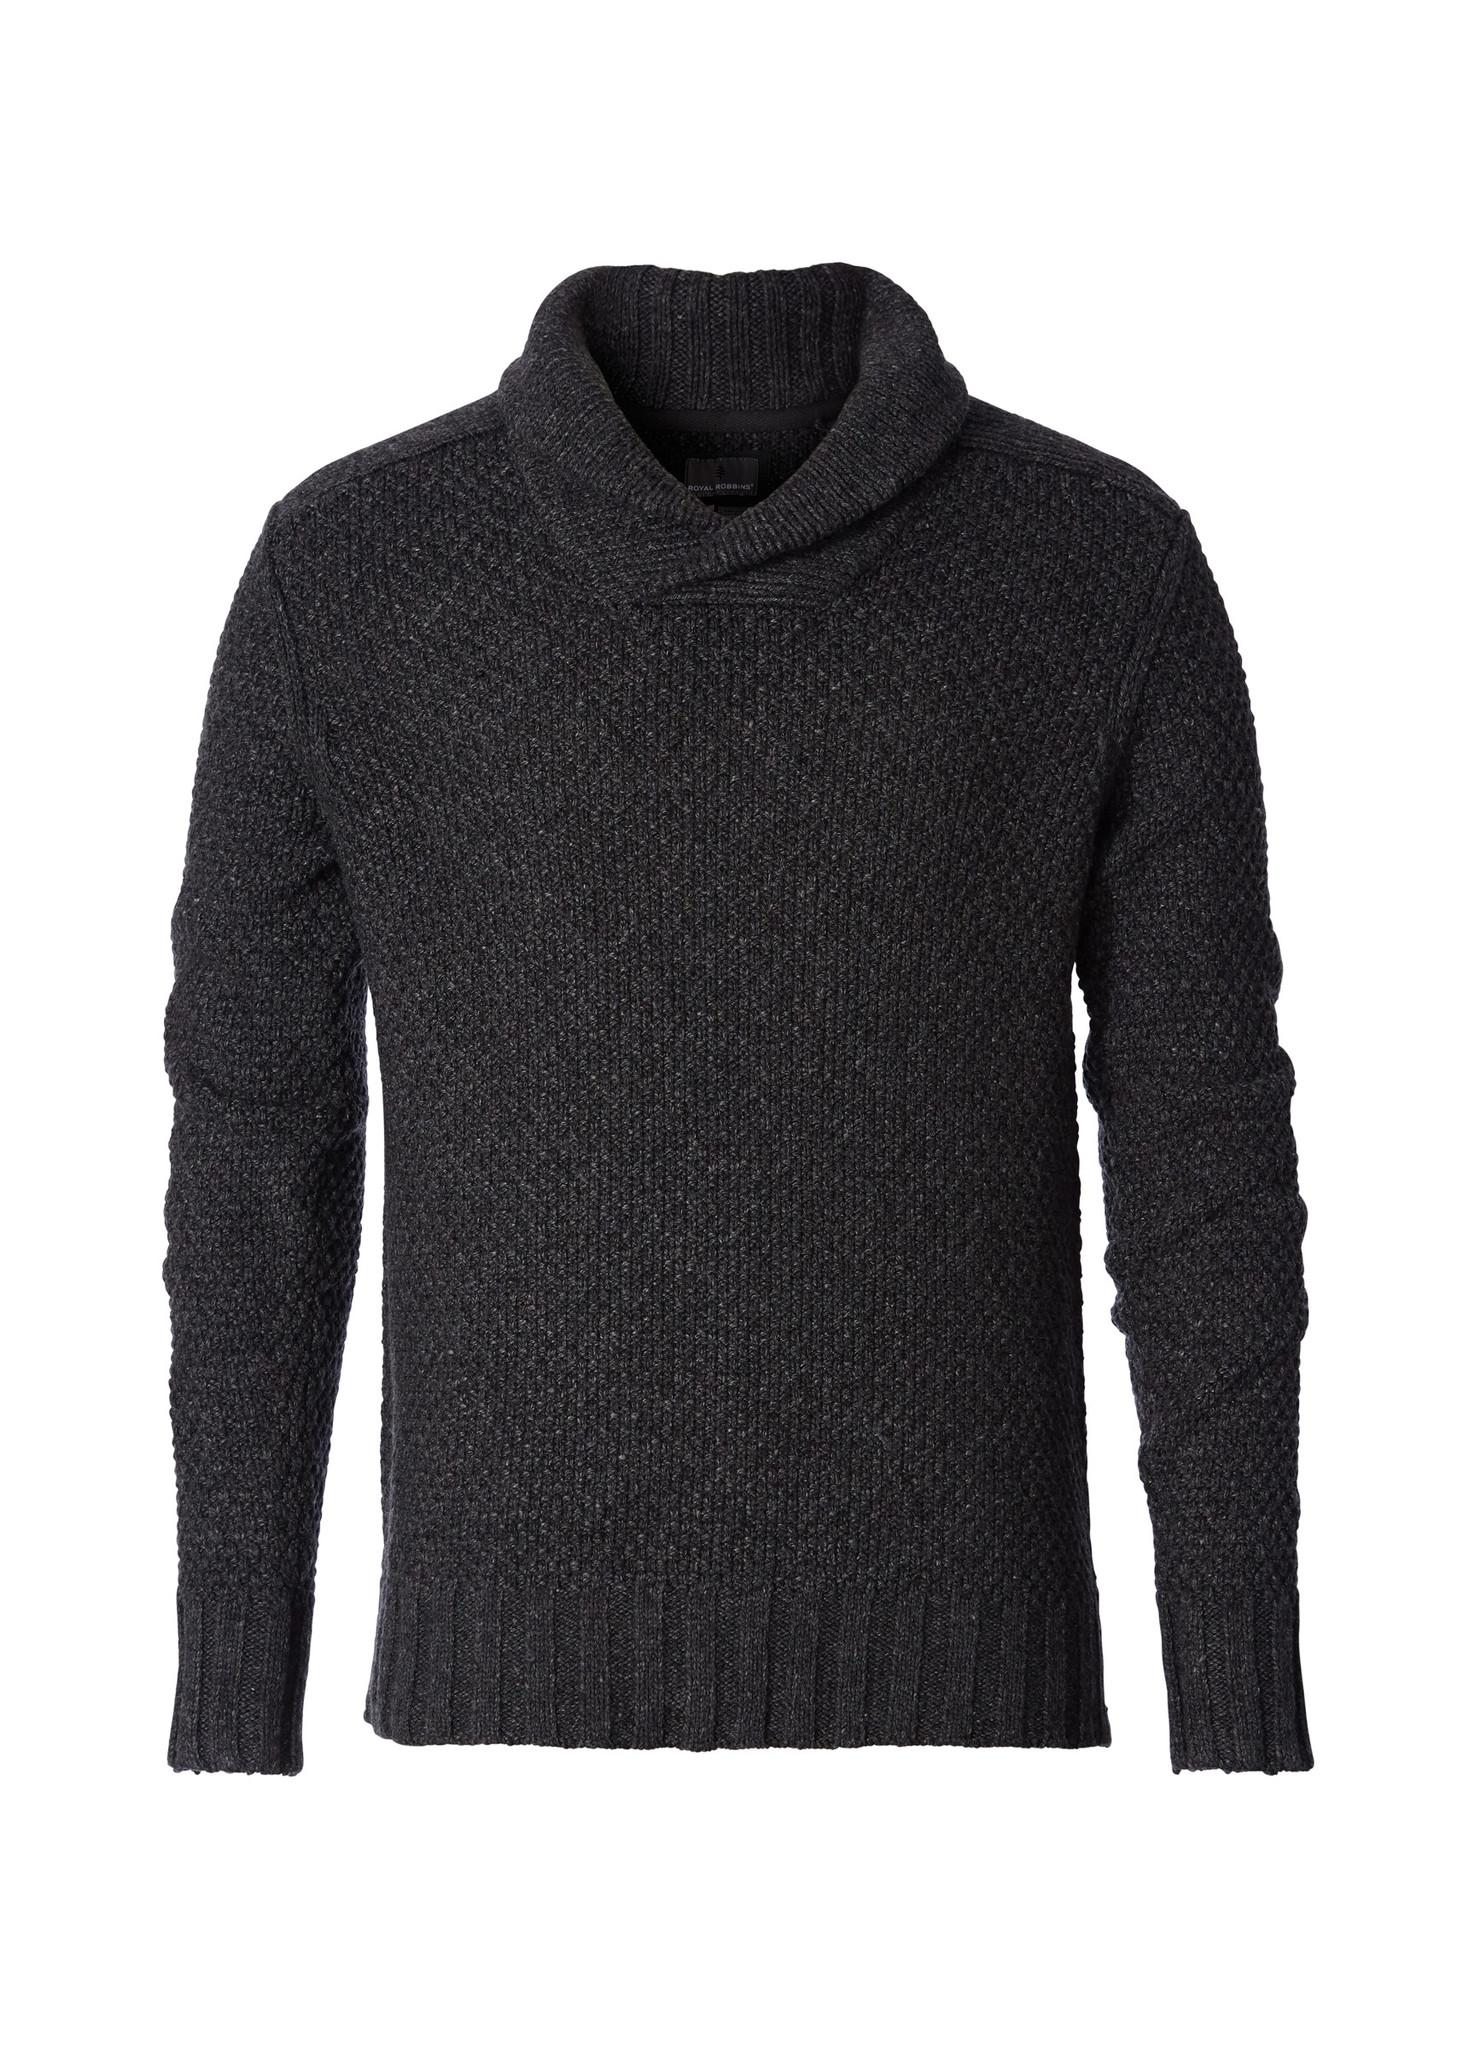 Royal Robbins Banff Sweater, Asphalt